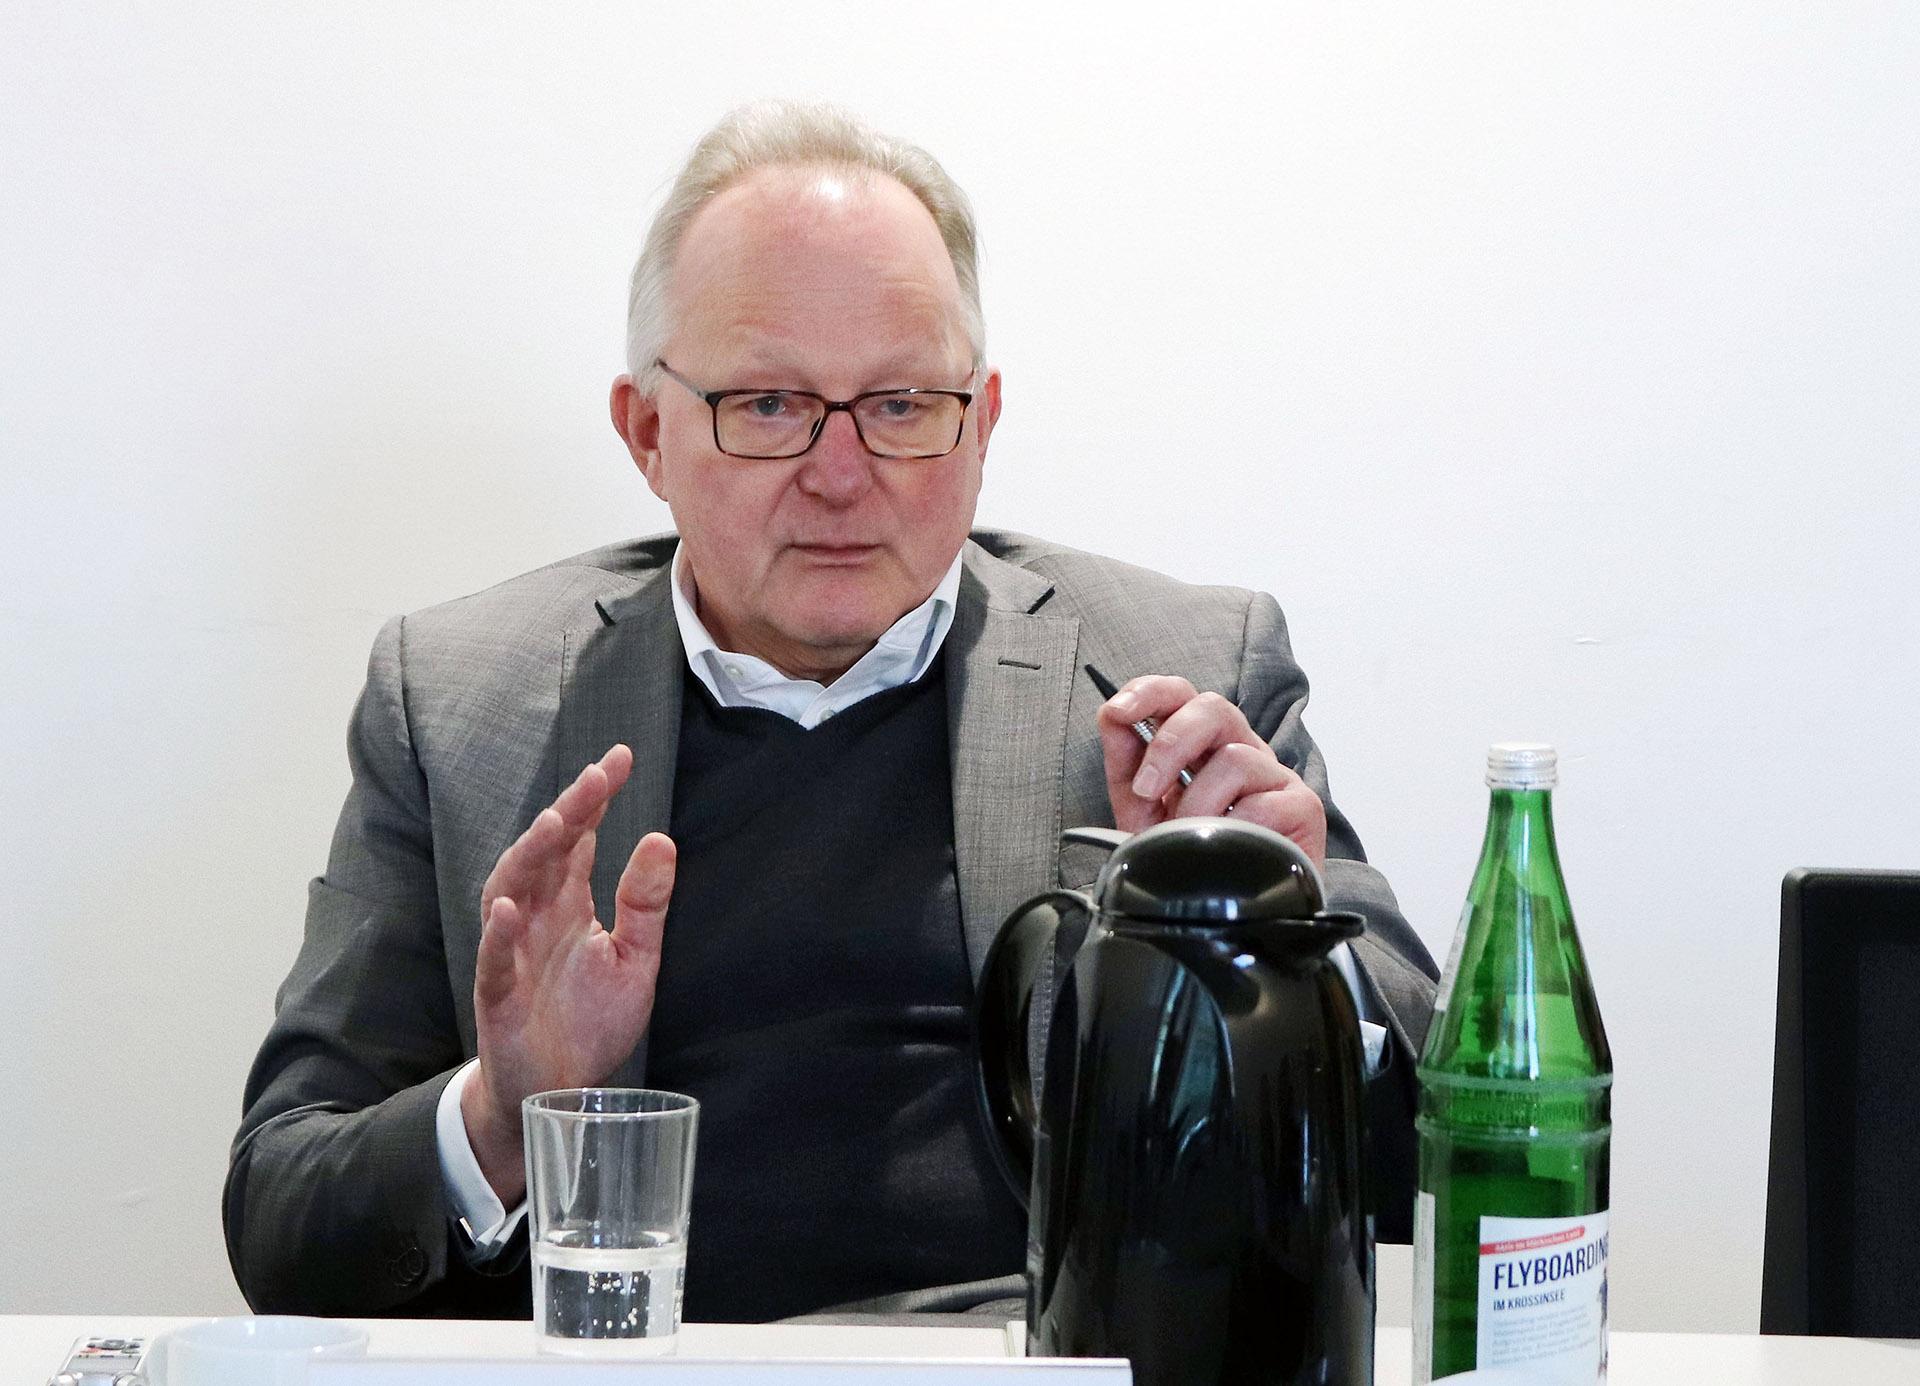 Prof. Dr. Jochen-Friedrich Buhrmann